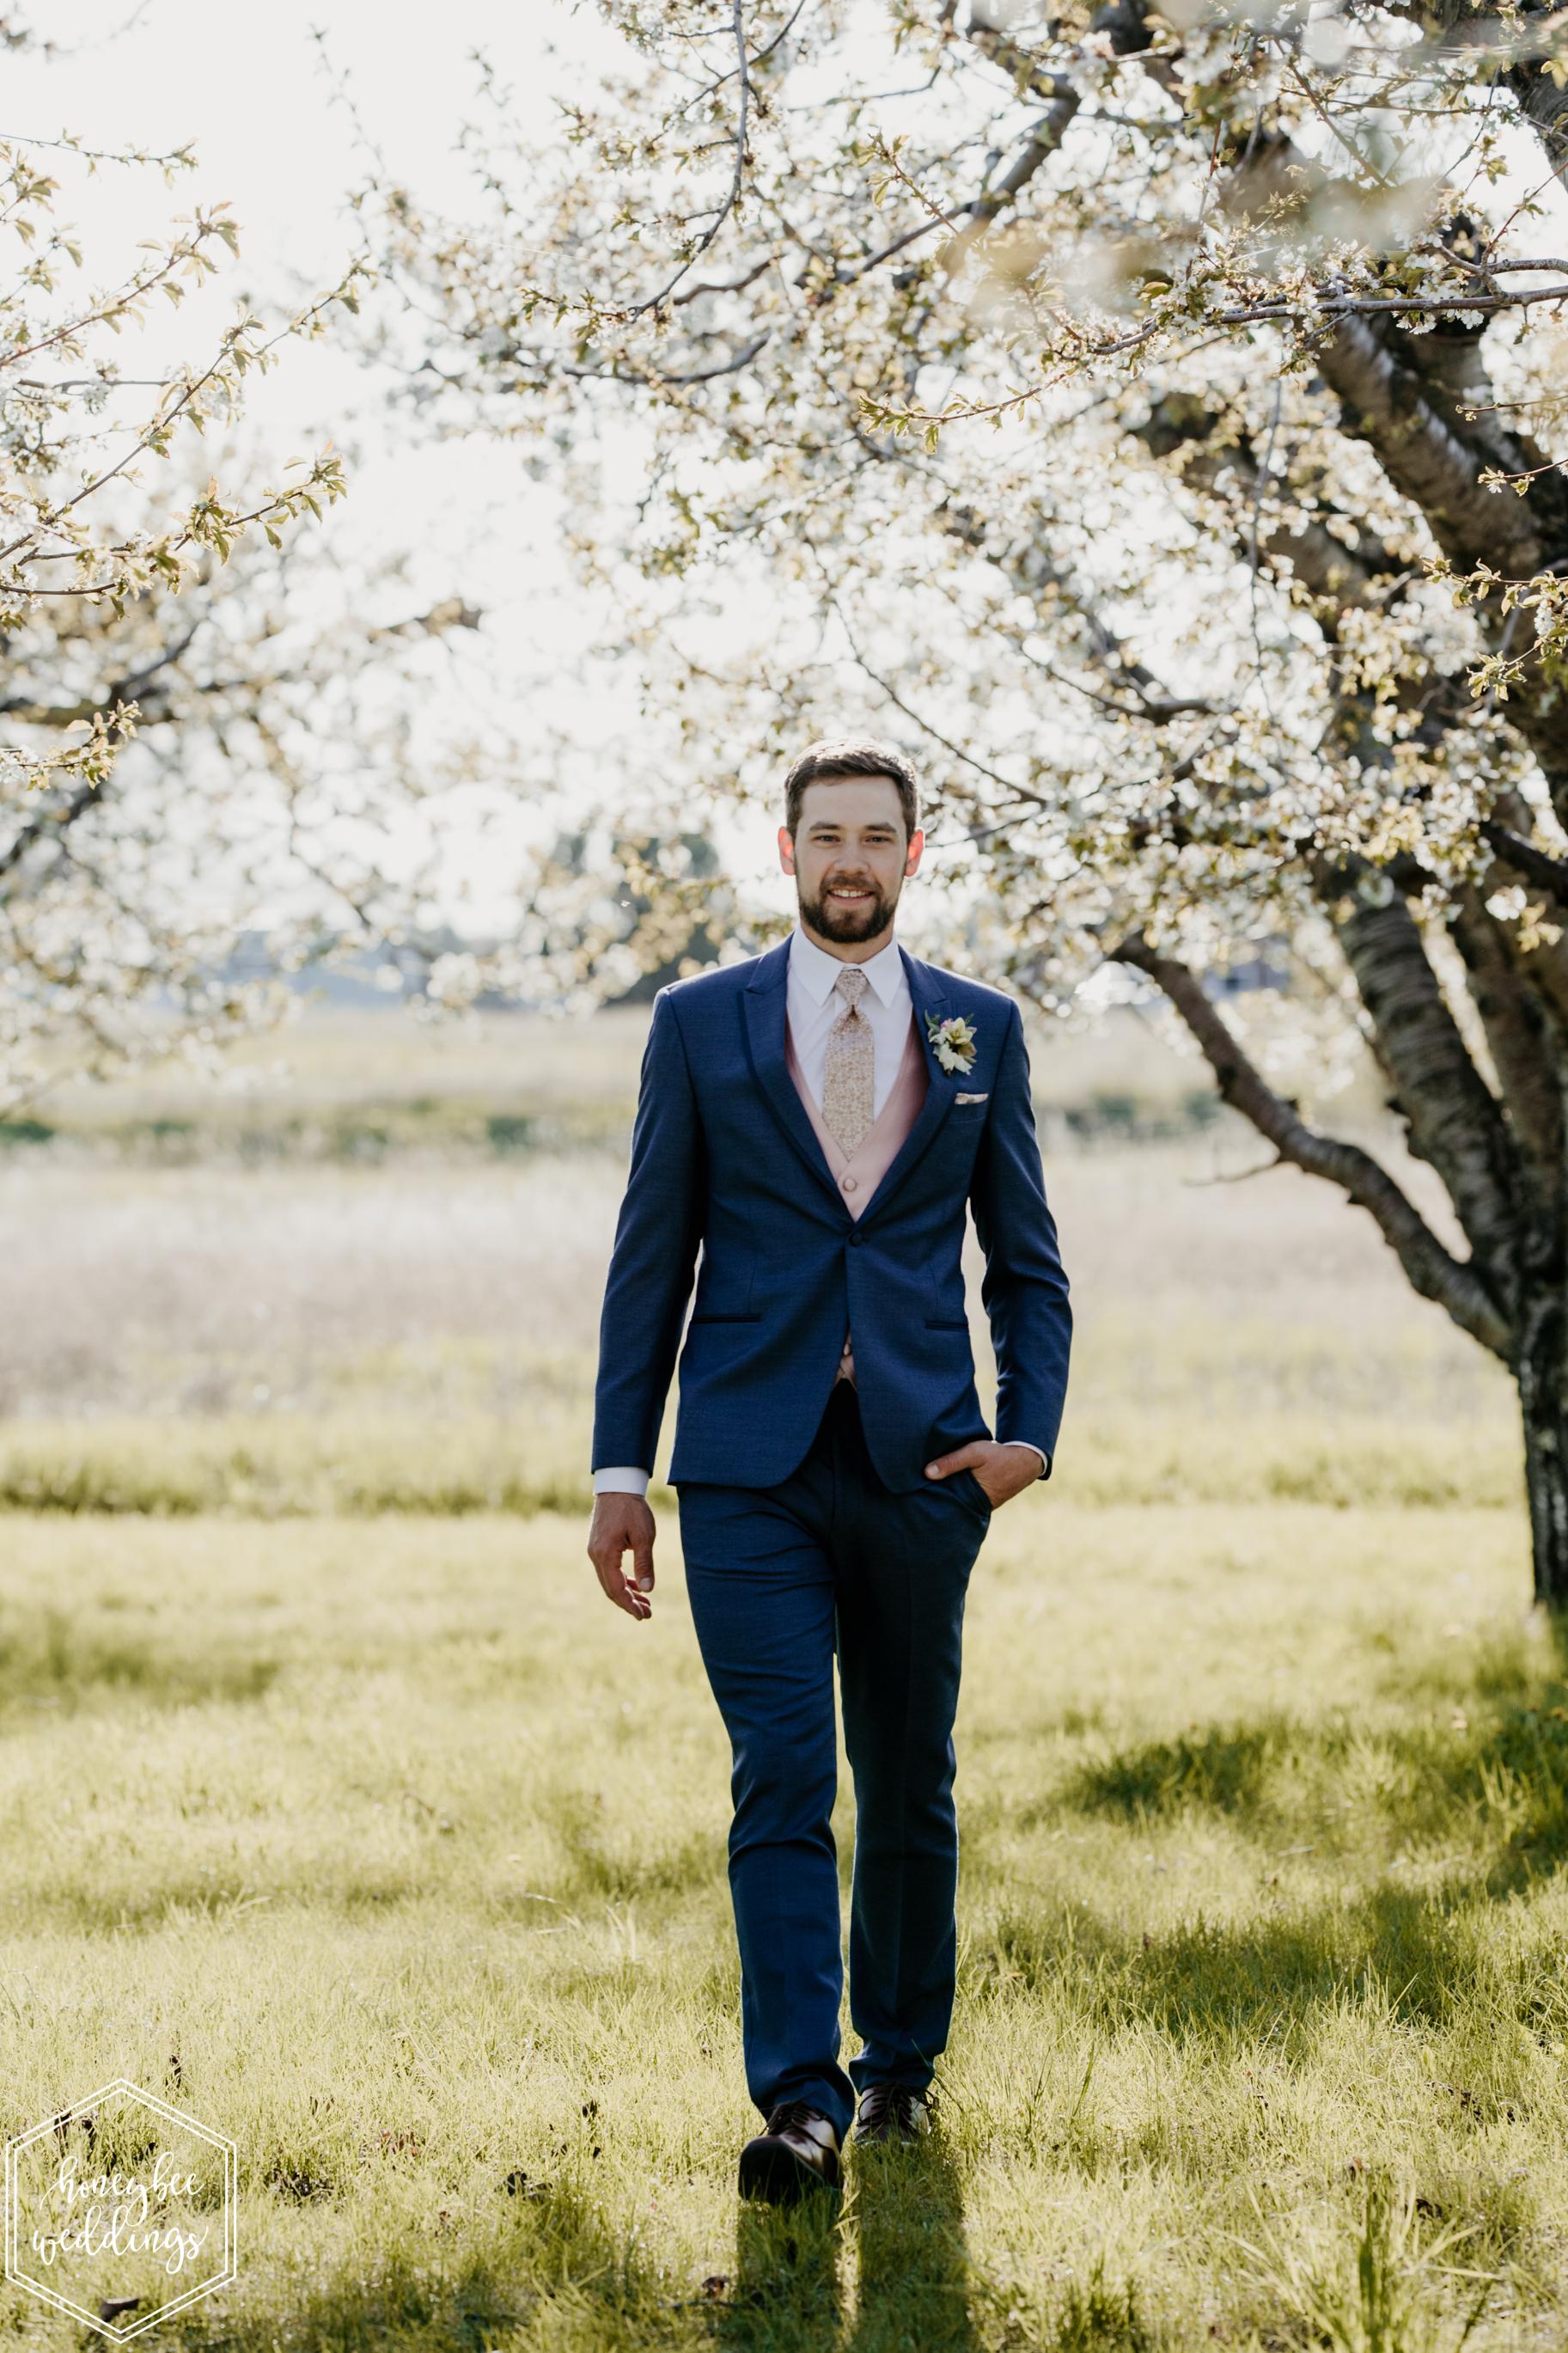 035Cherry Blossom Wedding_Styled Photoshoot_Honeybee Weddings_May 11, 2019-351.jpg